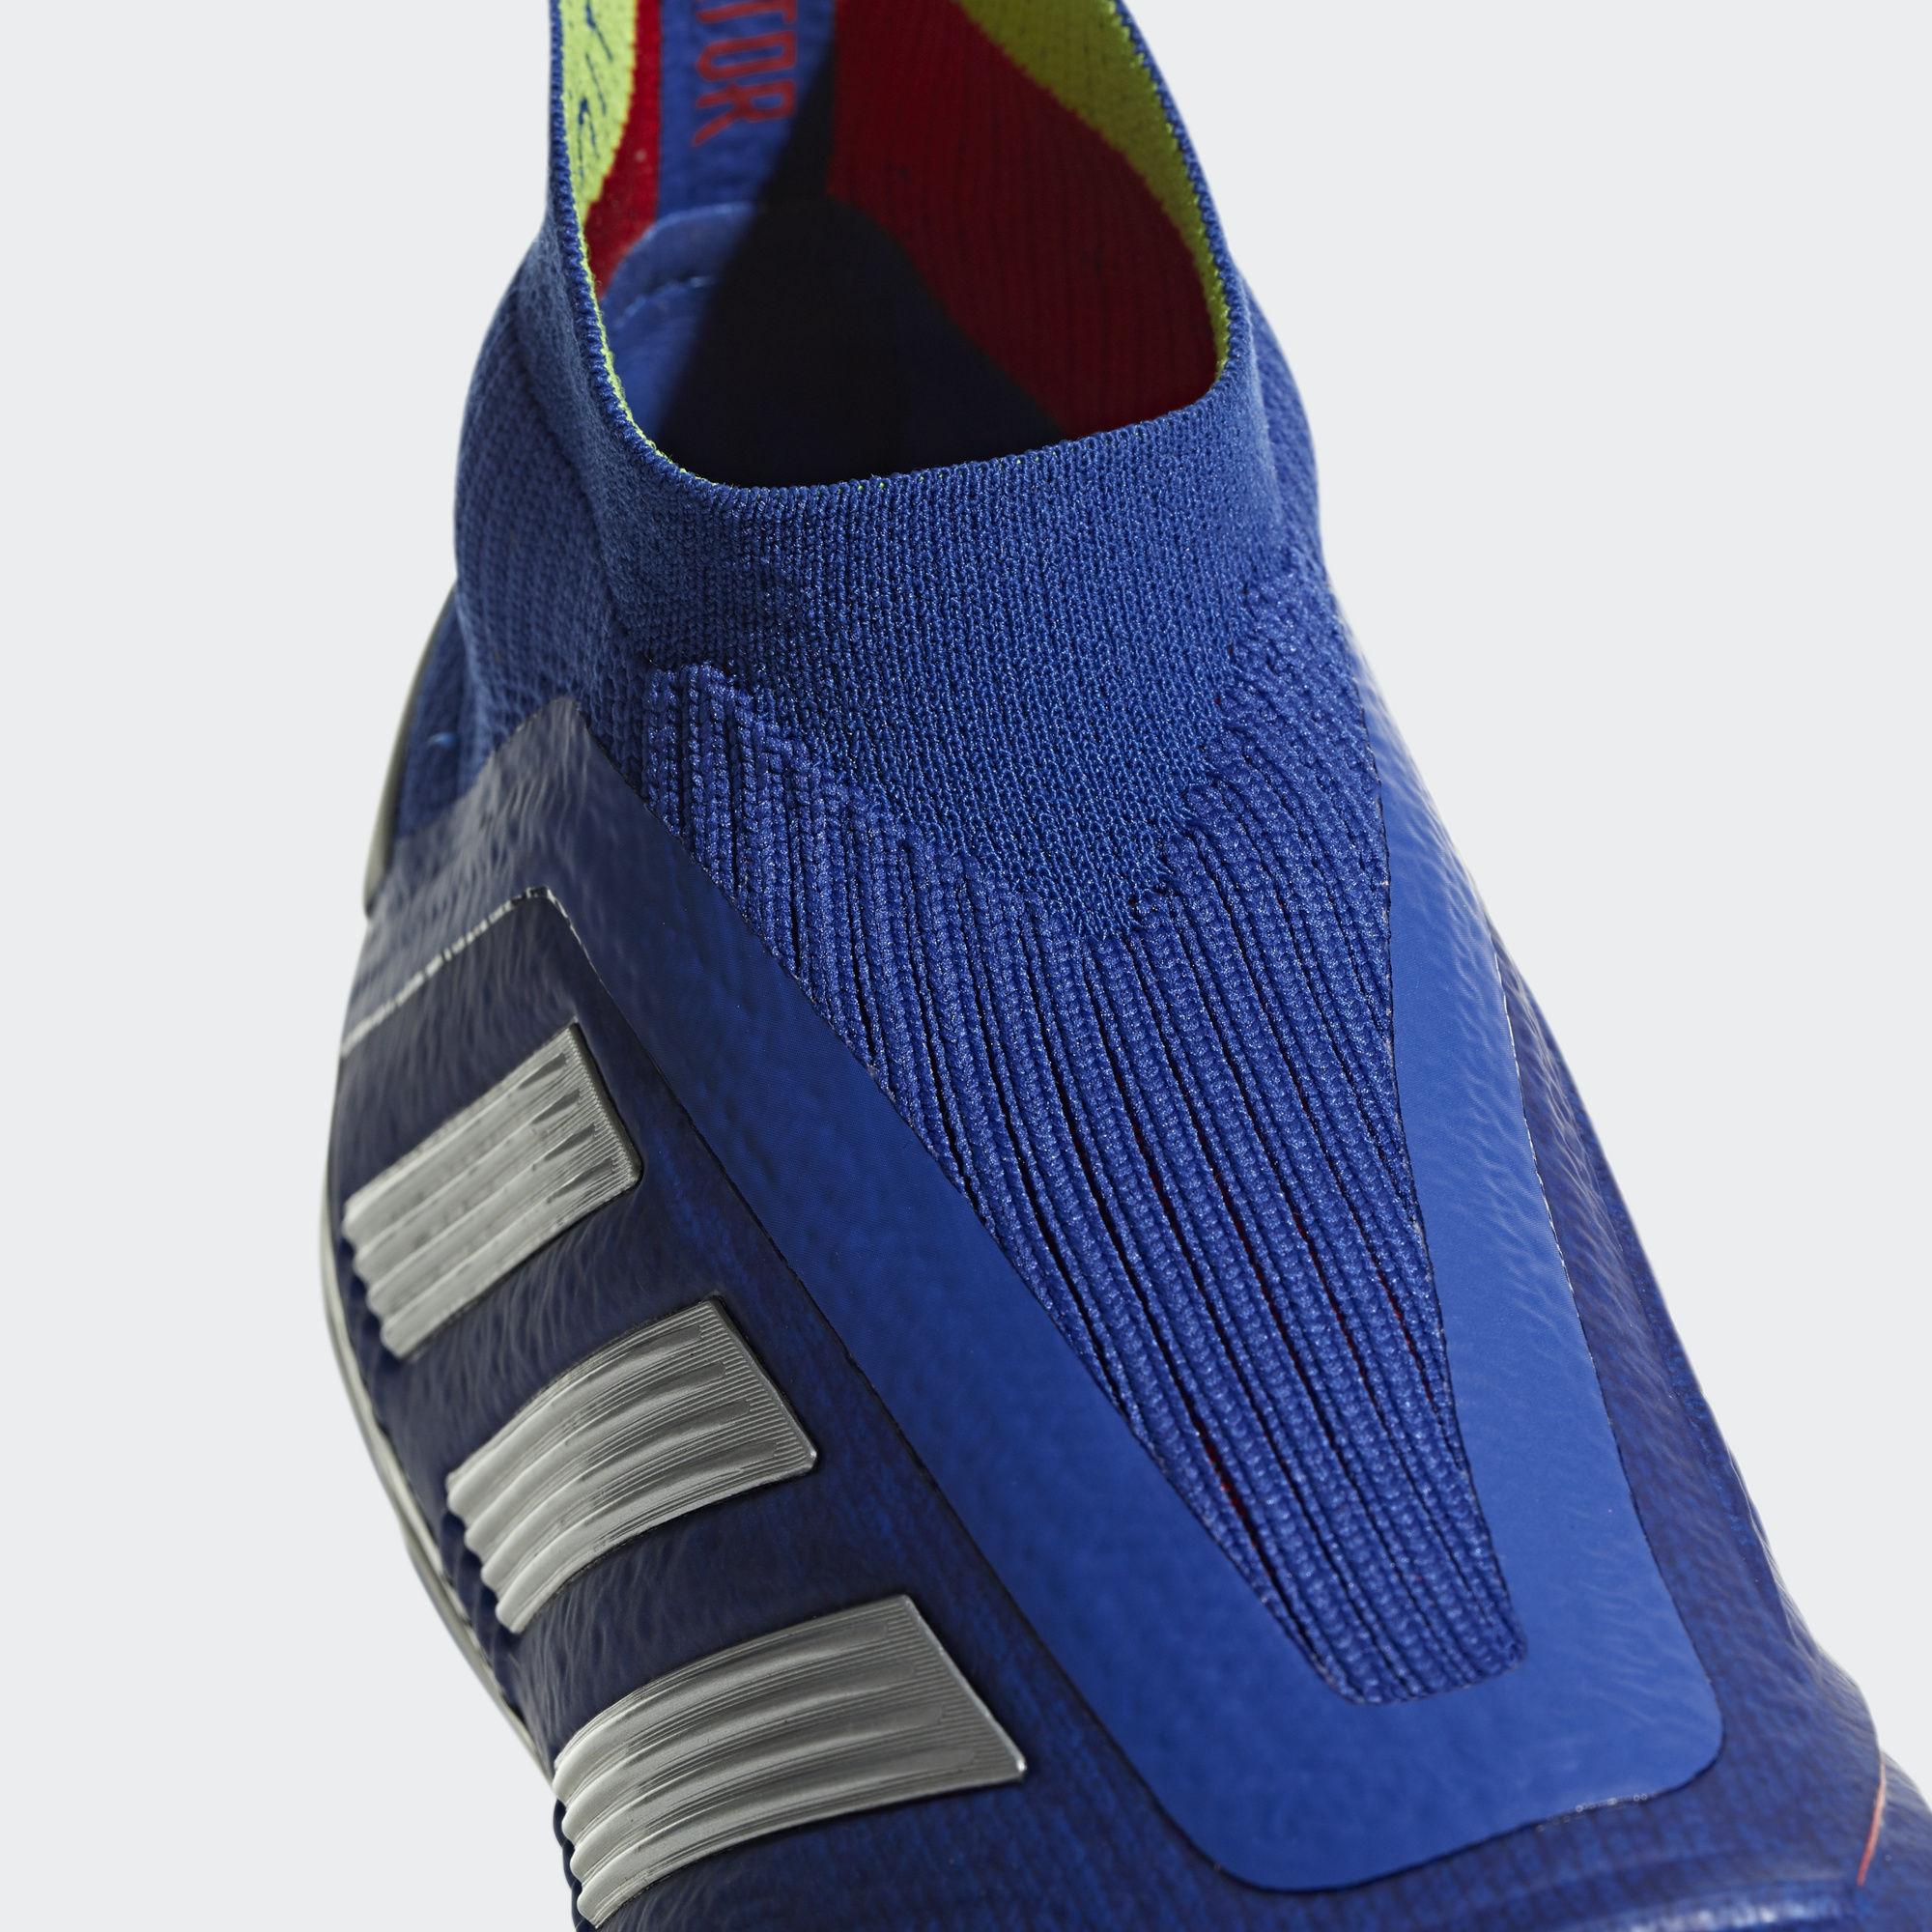 f2a50290 Футбольные бутсы Predator 19+ FG CM8527 adidas Performance - Украина ...